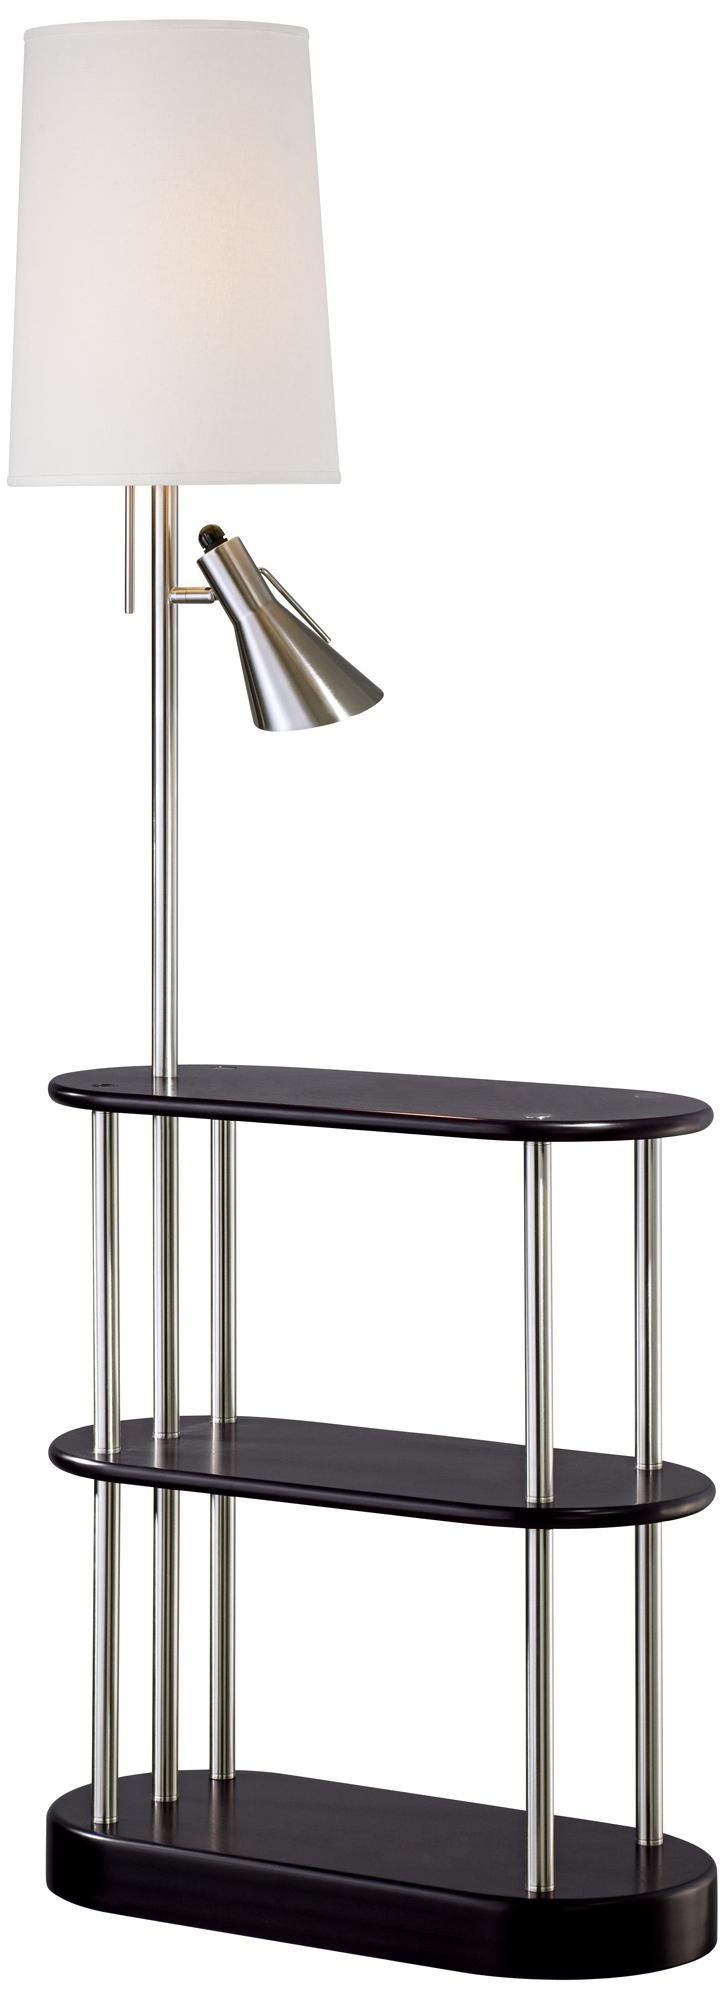 45a9d5d46c8ce31933b6b3d9774b31b5 lighting ideas floor lamps